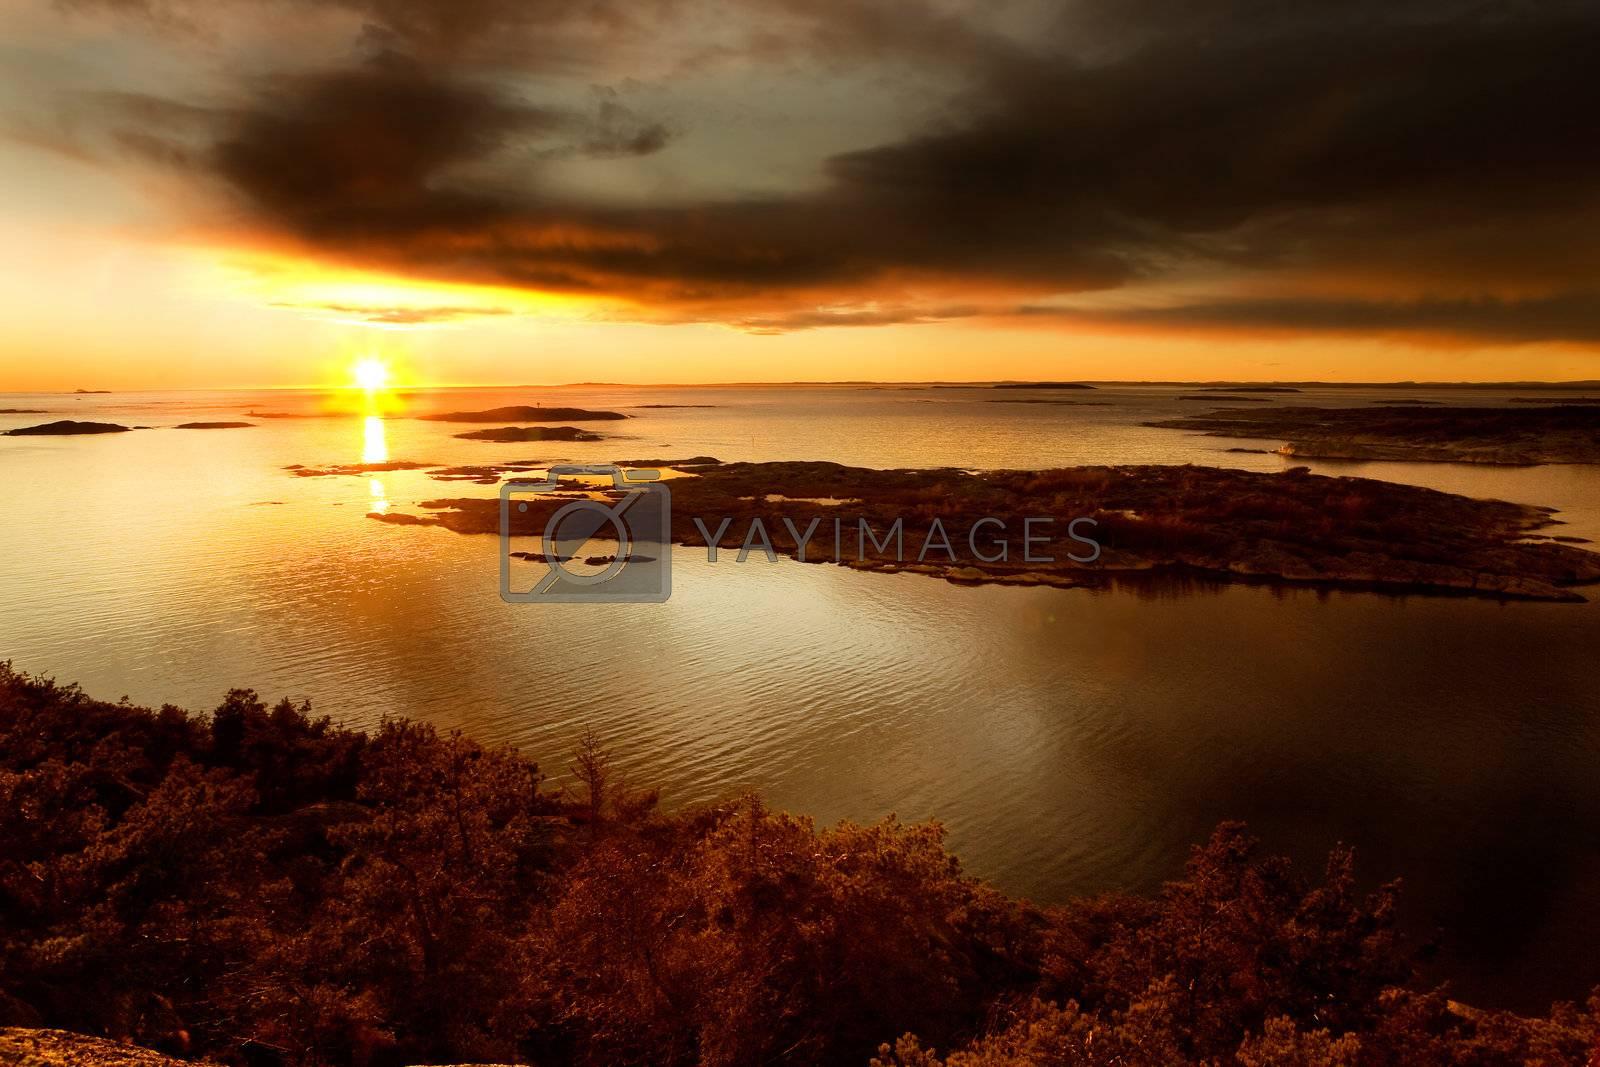 Coastal Landsacpe on the very outside of the Oslo Fjord near Fredrikstad, Norway.